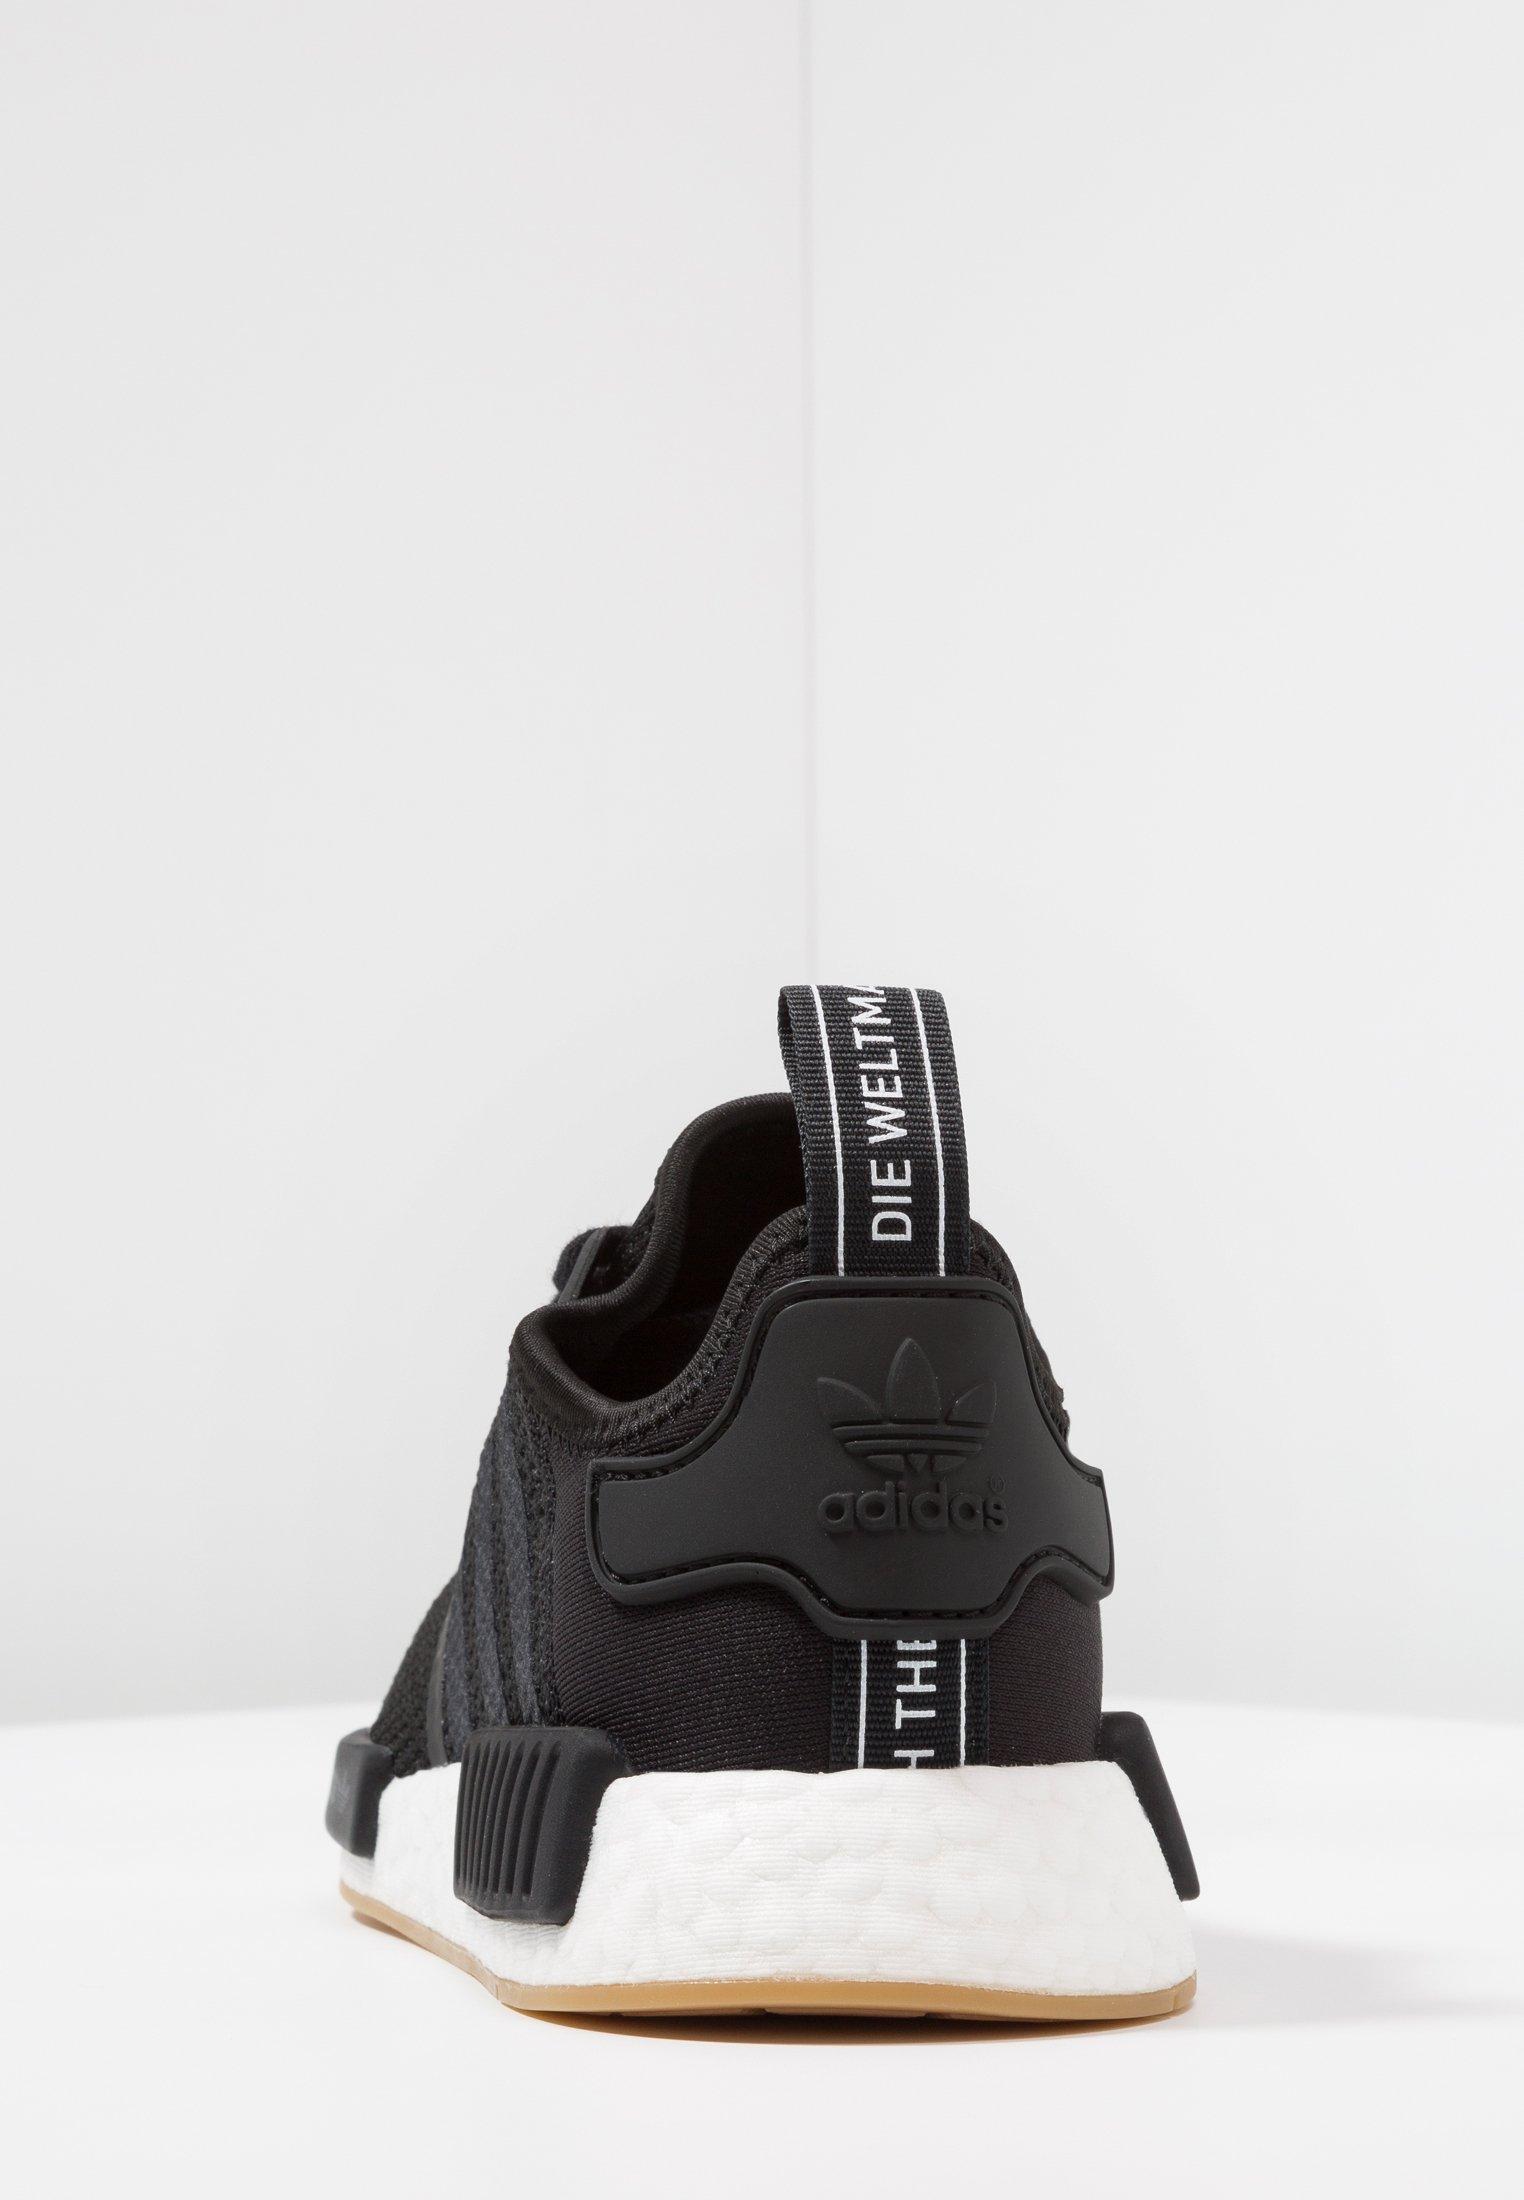 Adidas Originals Nmd_r1 - Sneakers Laag Core Black 4HWBNTC